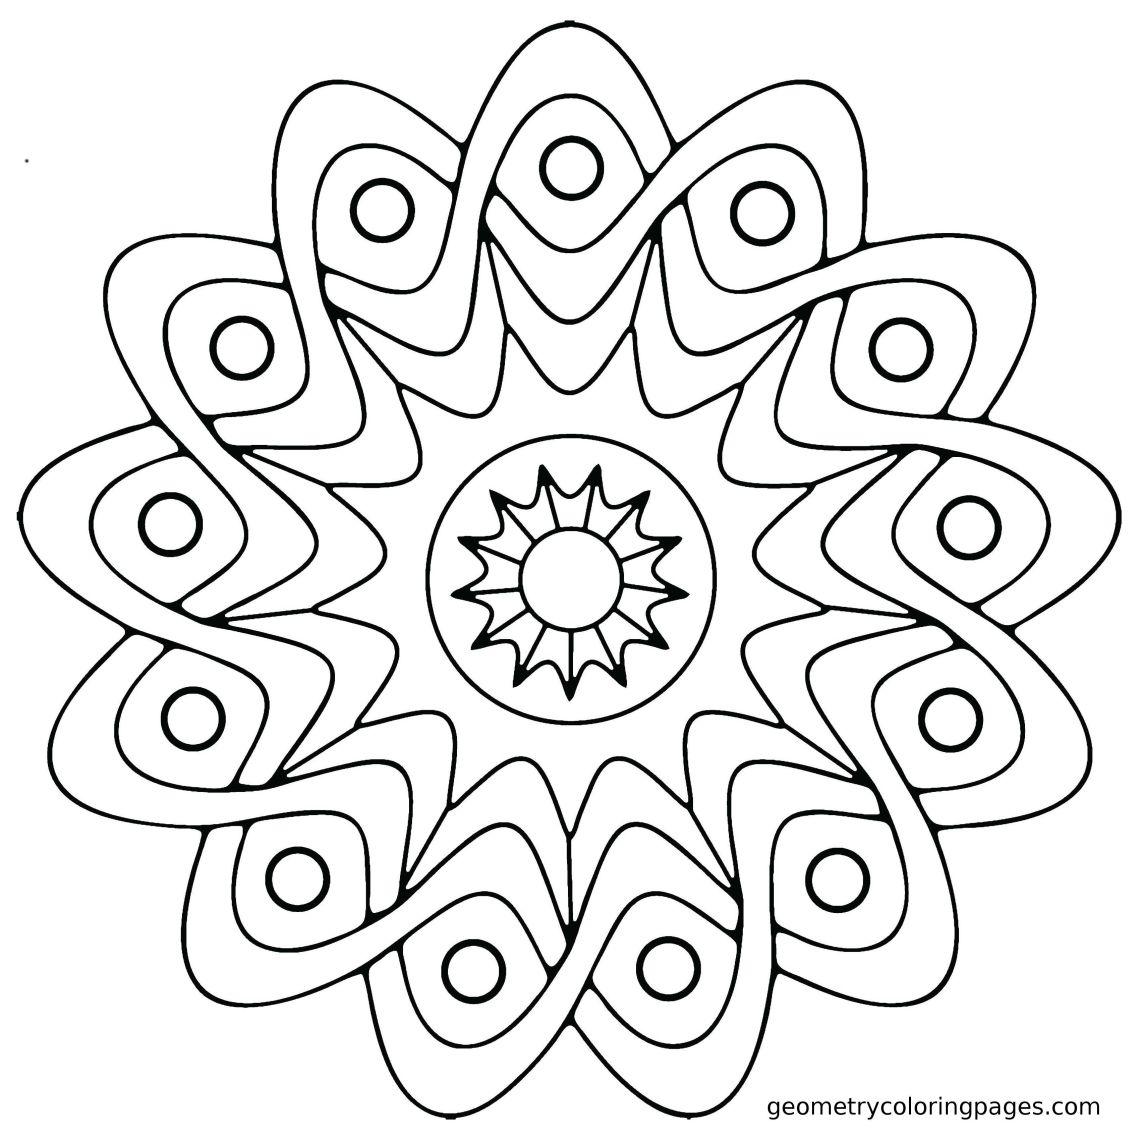 Mandala Coloring Pages Easy Mandala Coloring Pages ...   free printable mandala coloring pages for adults easy